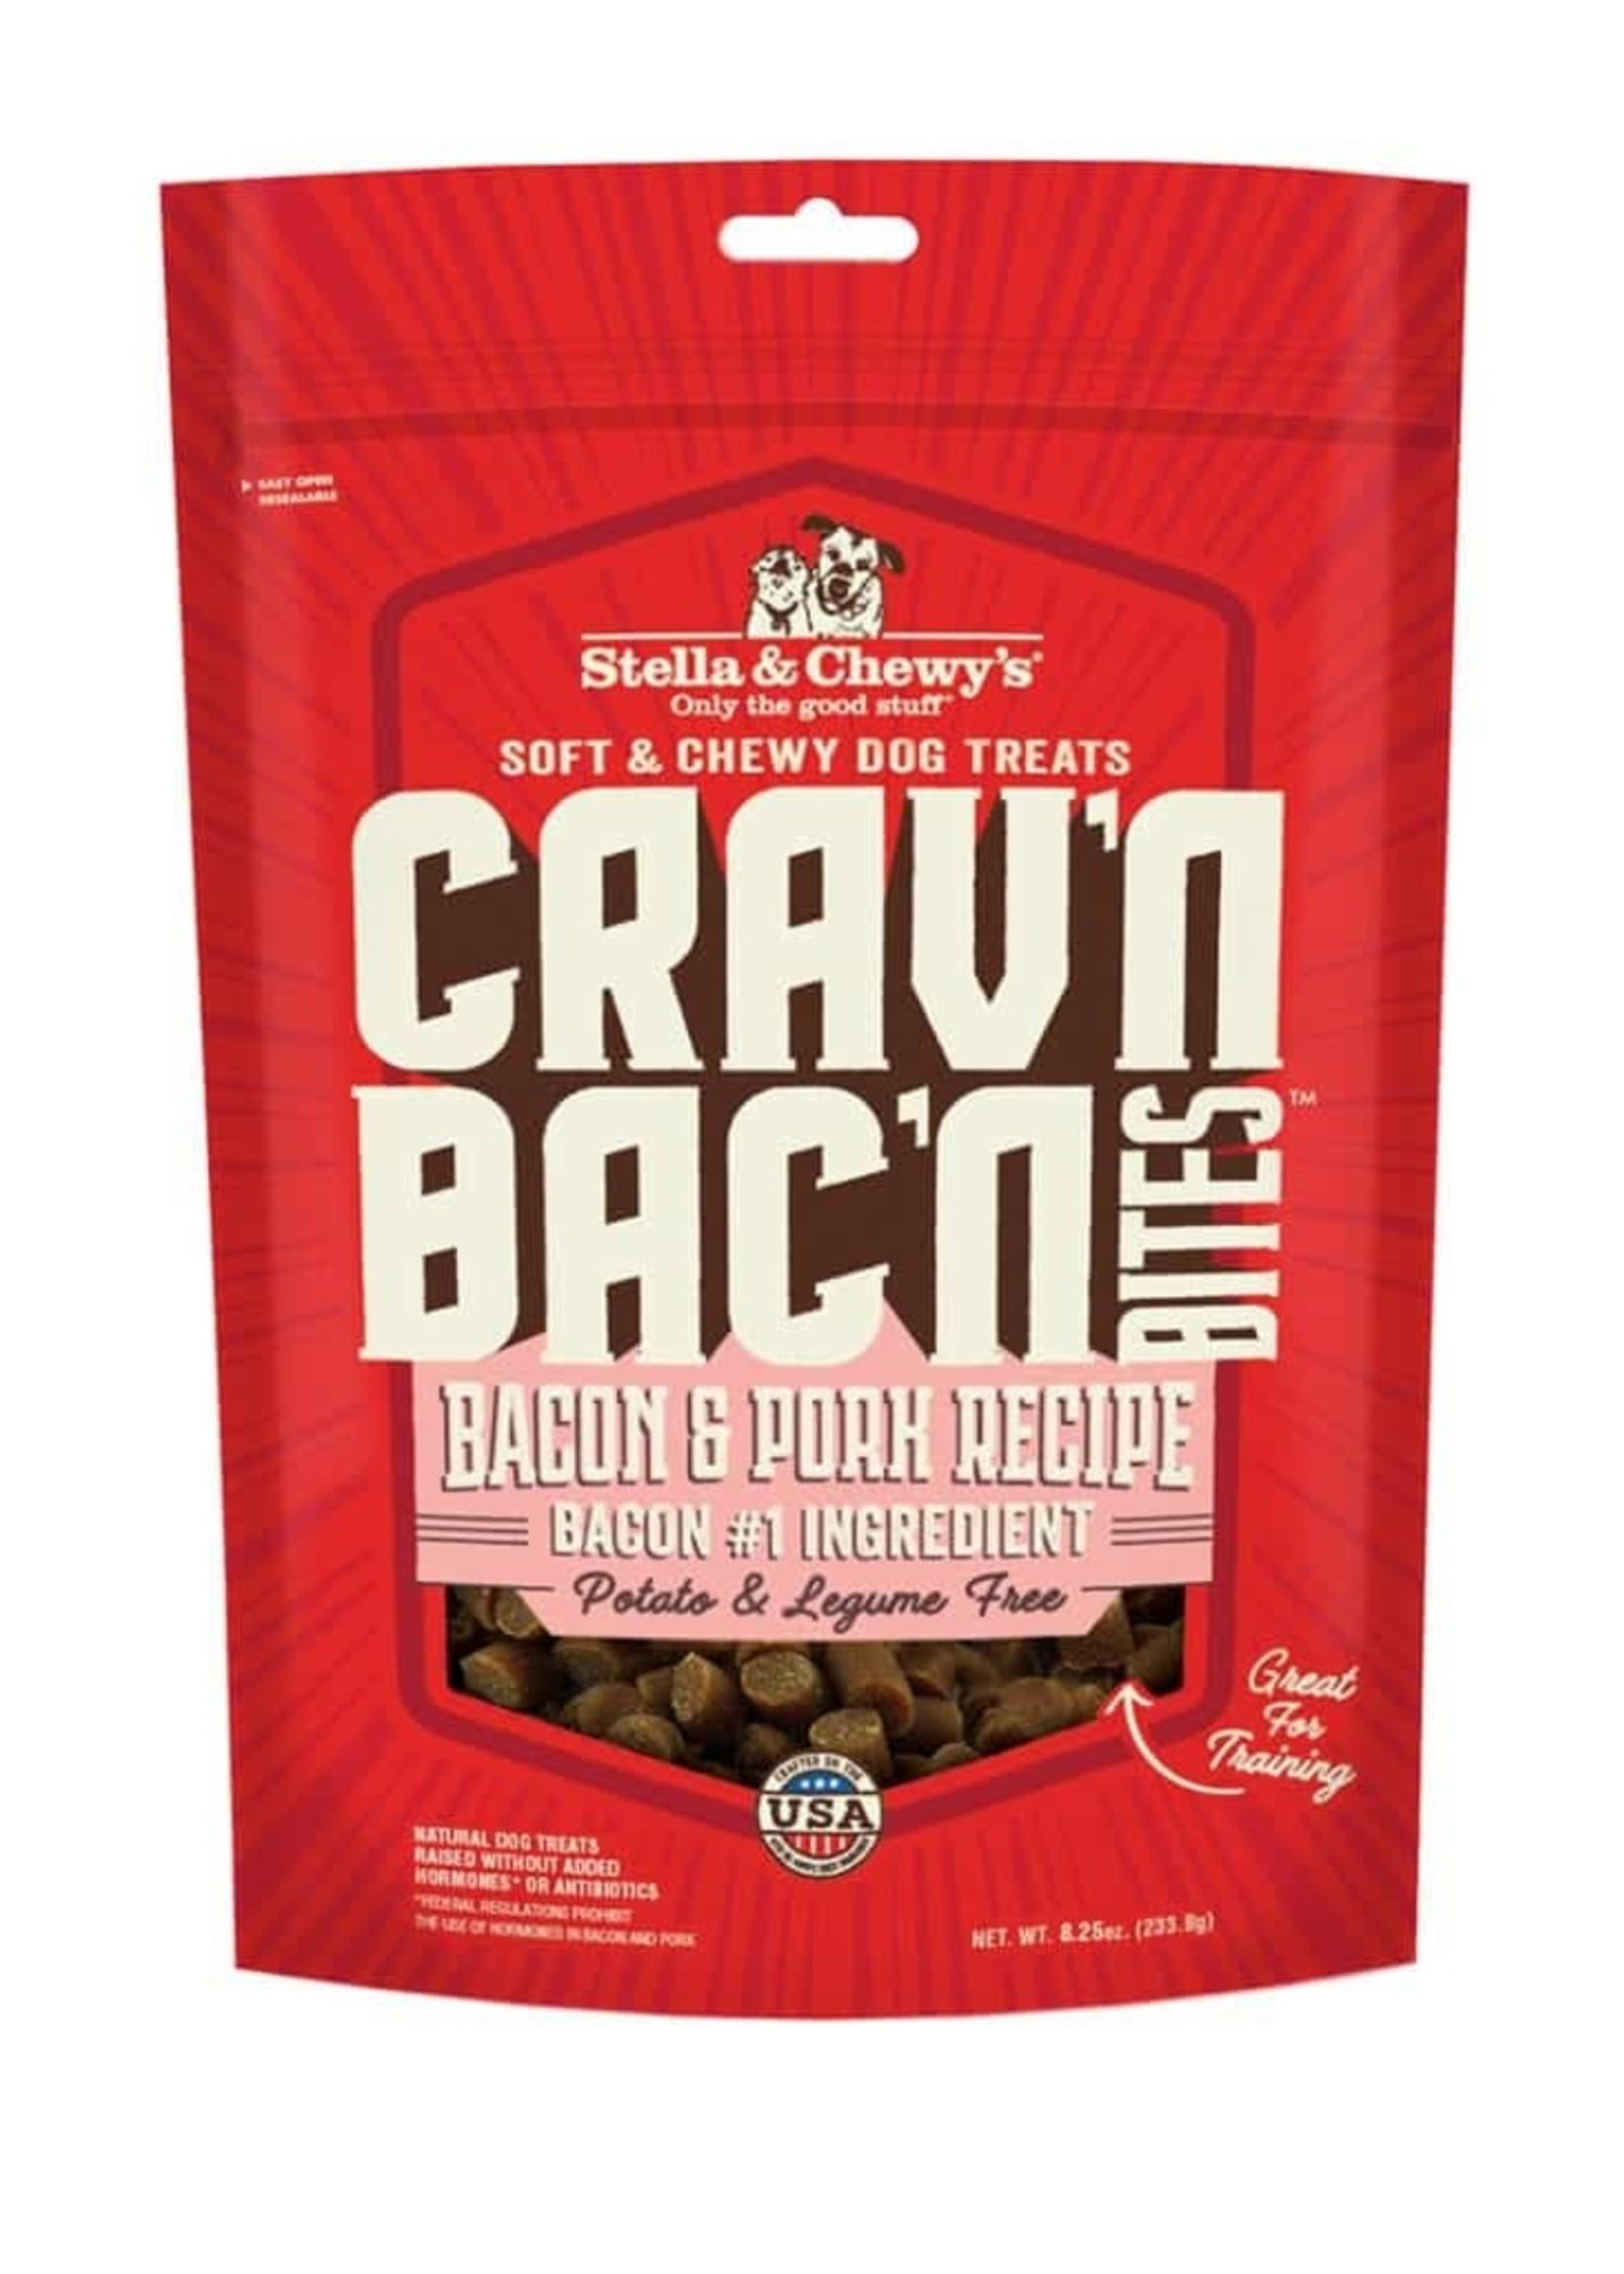 STELLA & CHEWY'S Crav'n Bac'n  Bites Pork